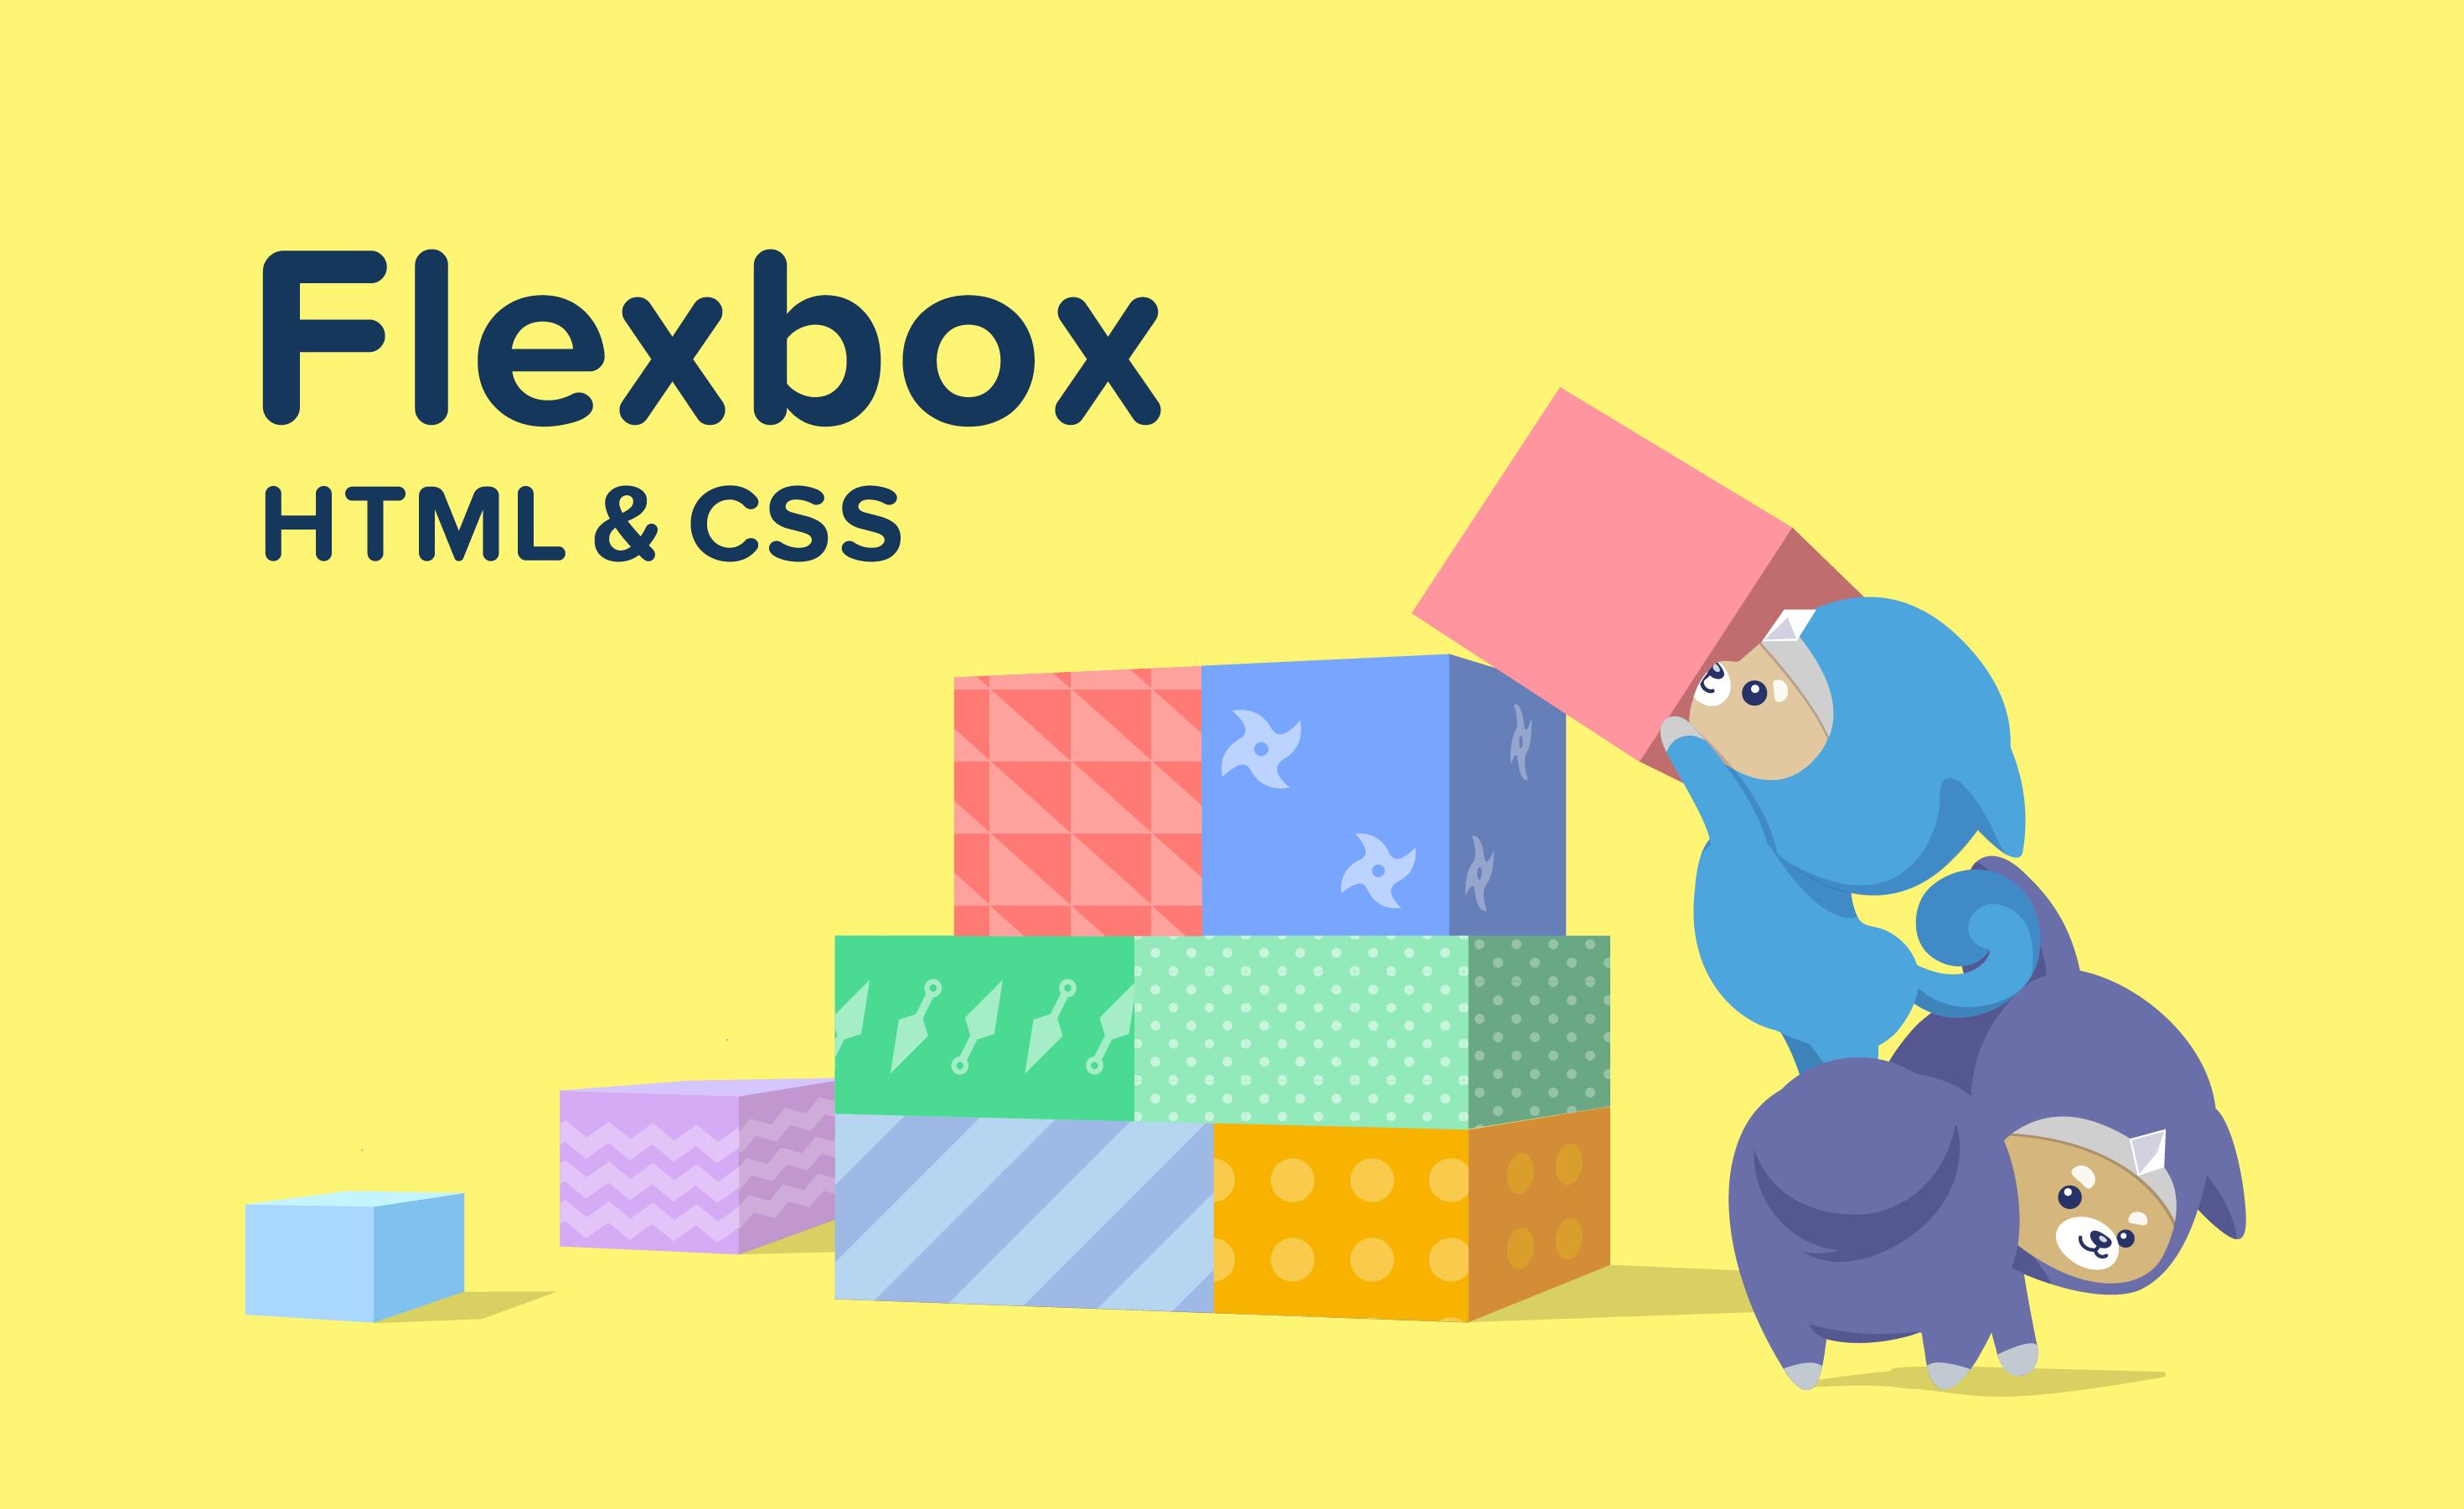 HTML & CSS 学習コース Flexbox編 | Progate